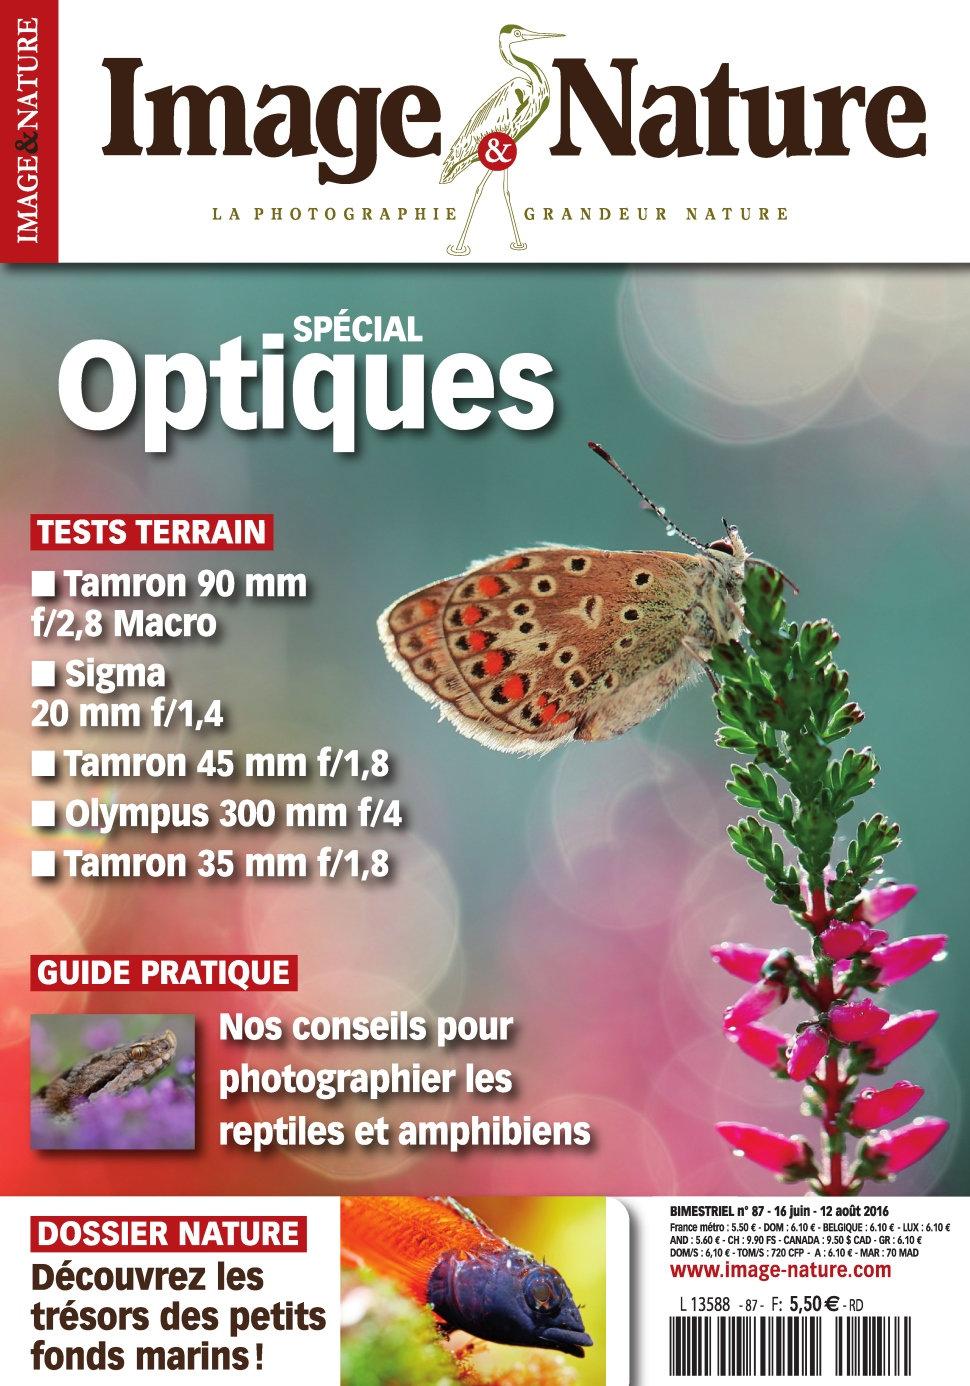 Image & Nature N°87 - Juillet/Aout 2016